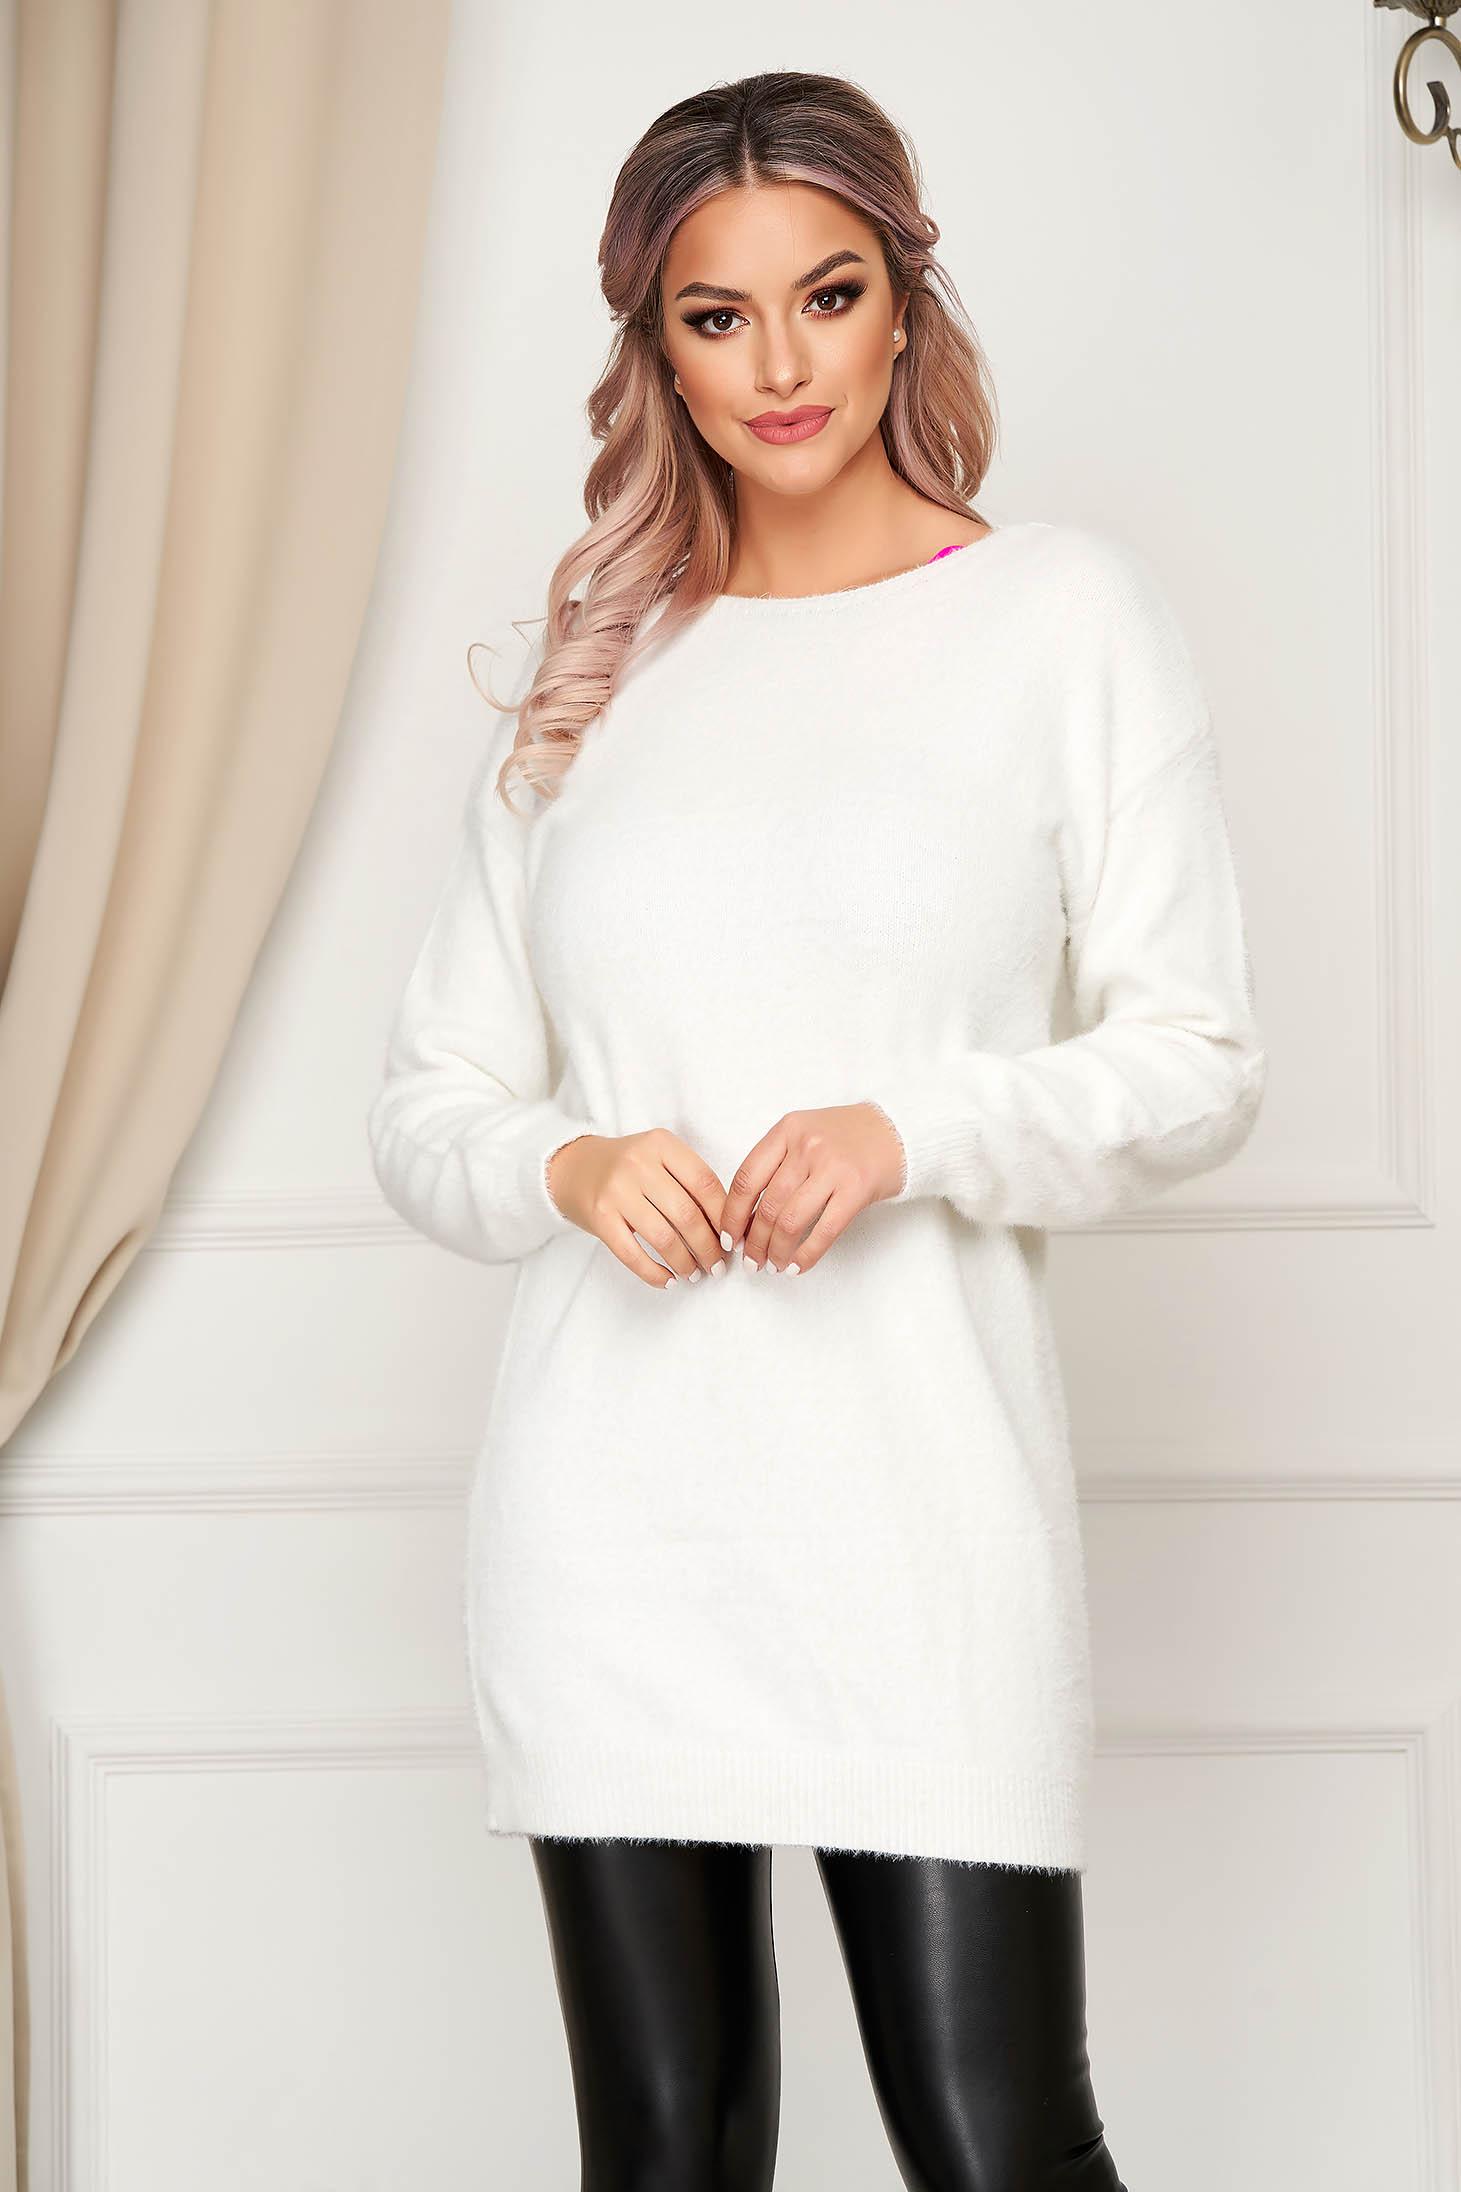 Pulover SunShine alb cu croi larg cu decolteu in v cu aplicatii de dantela din material tricotat